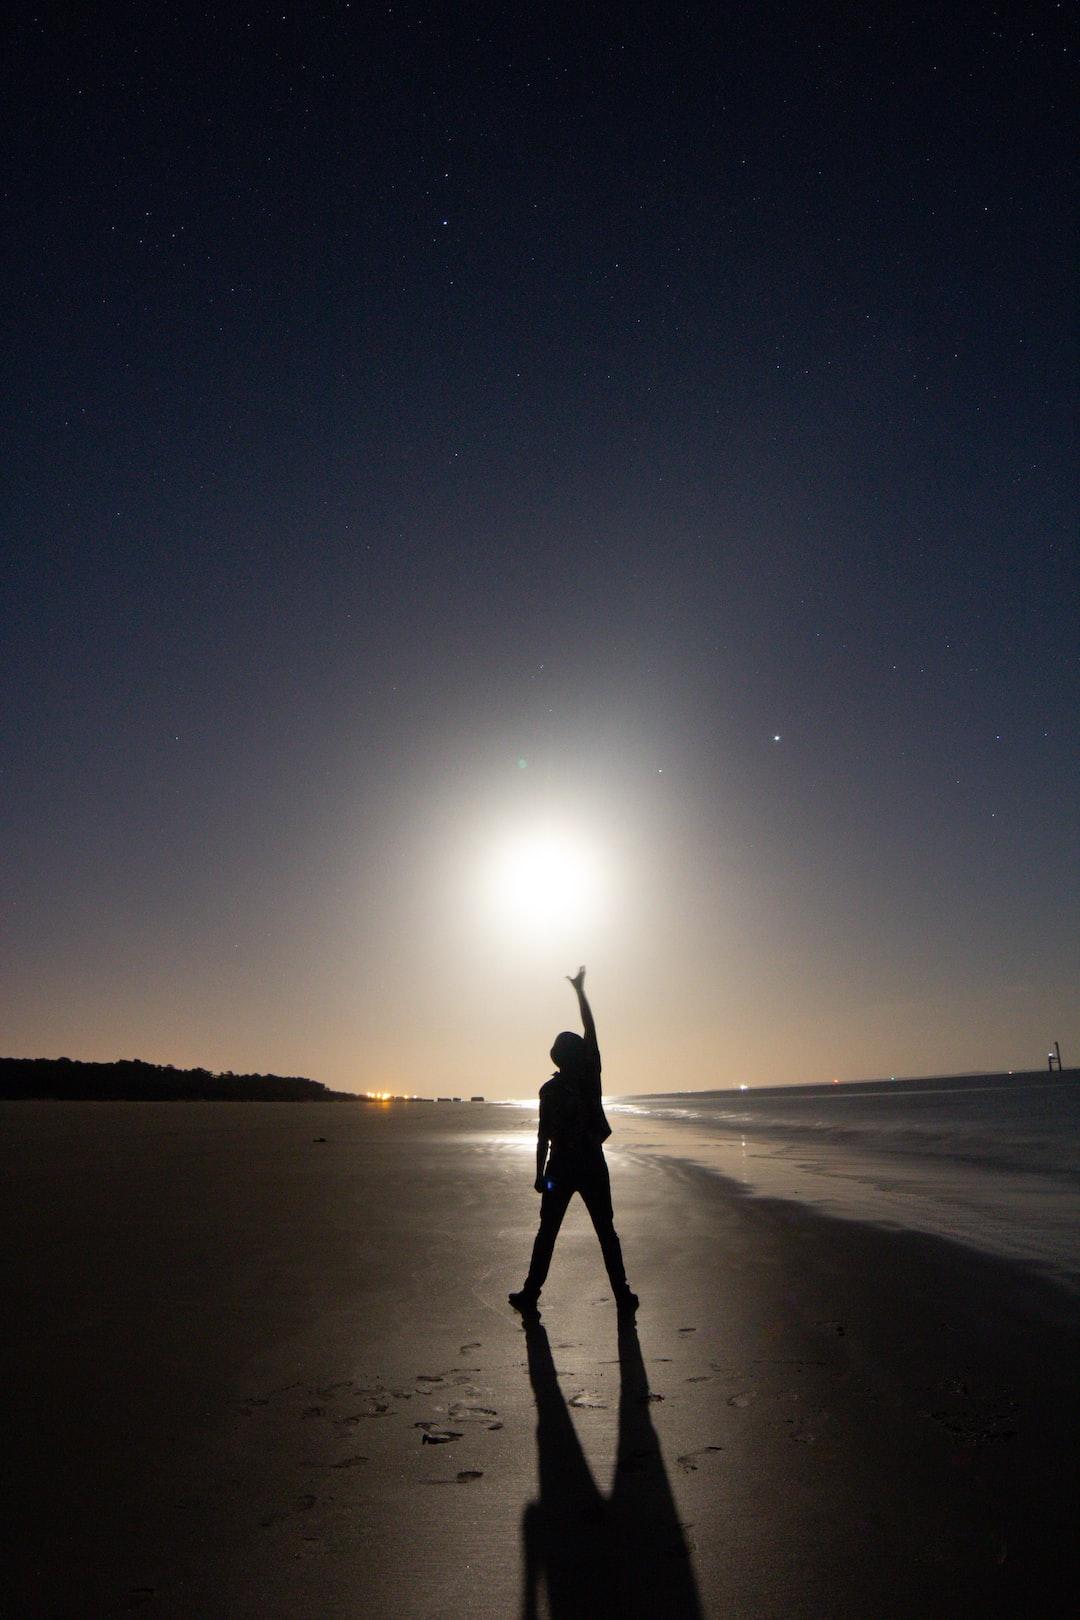 Genkidama at the beach